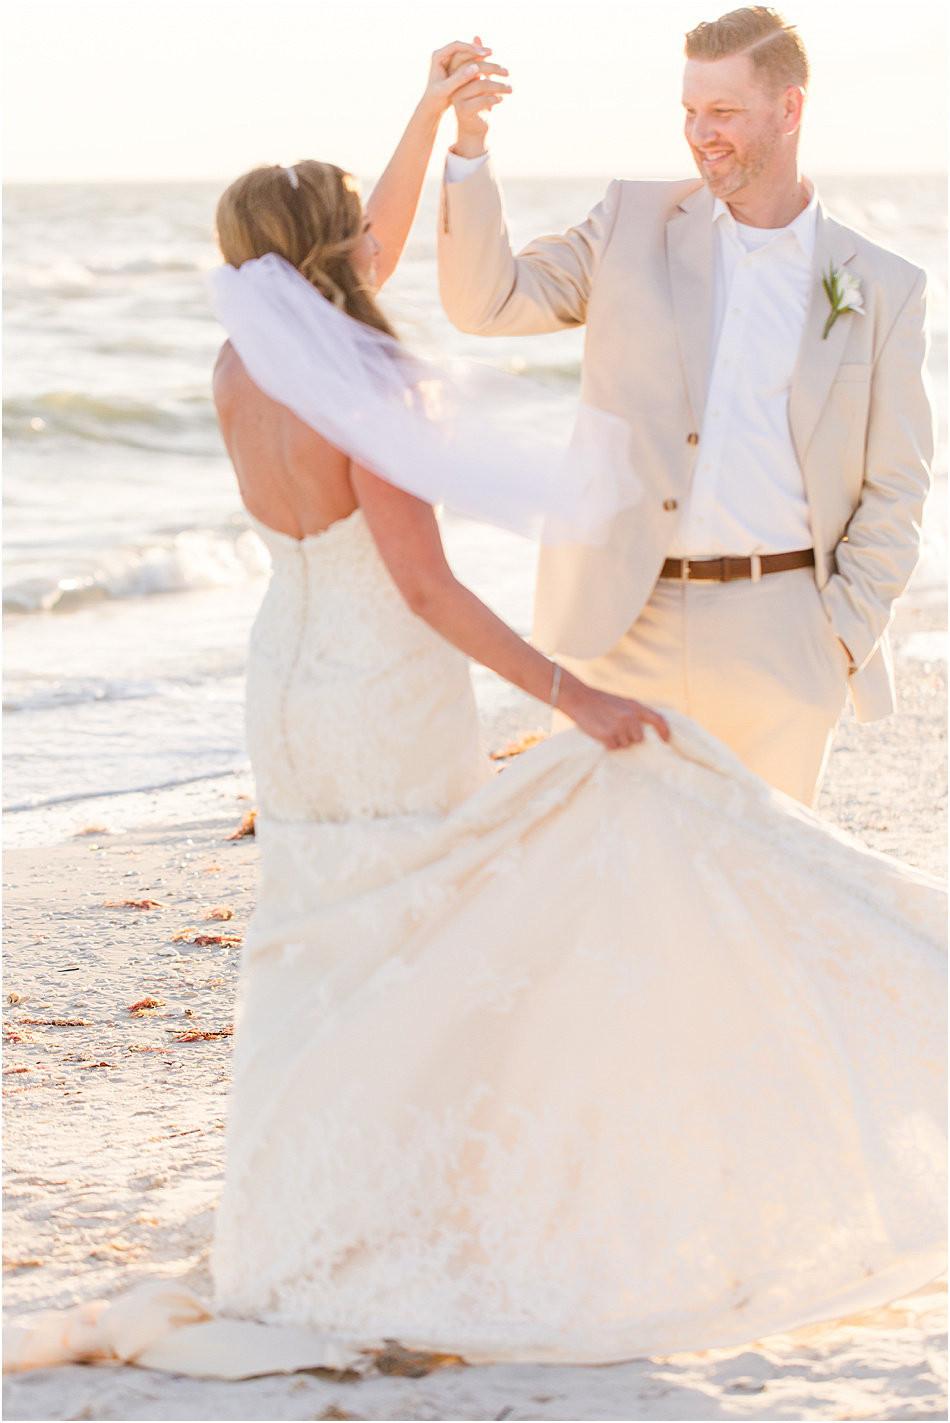 Sunset Beach Wedding Photo